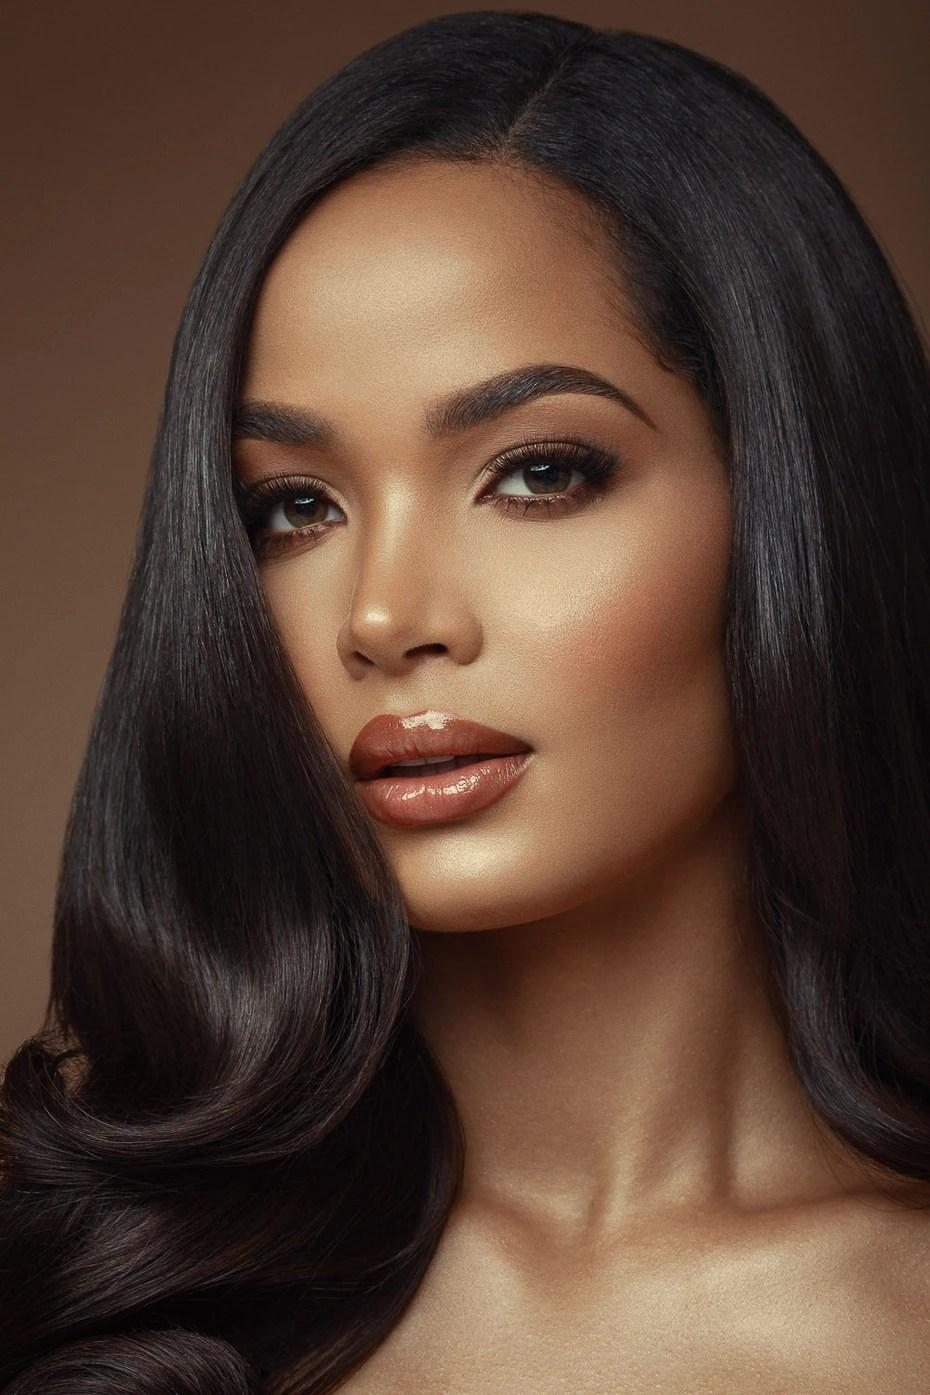 República Dominicana, Kimberly Jimenez, 24 años.